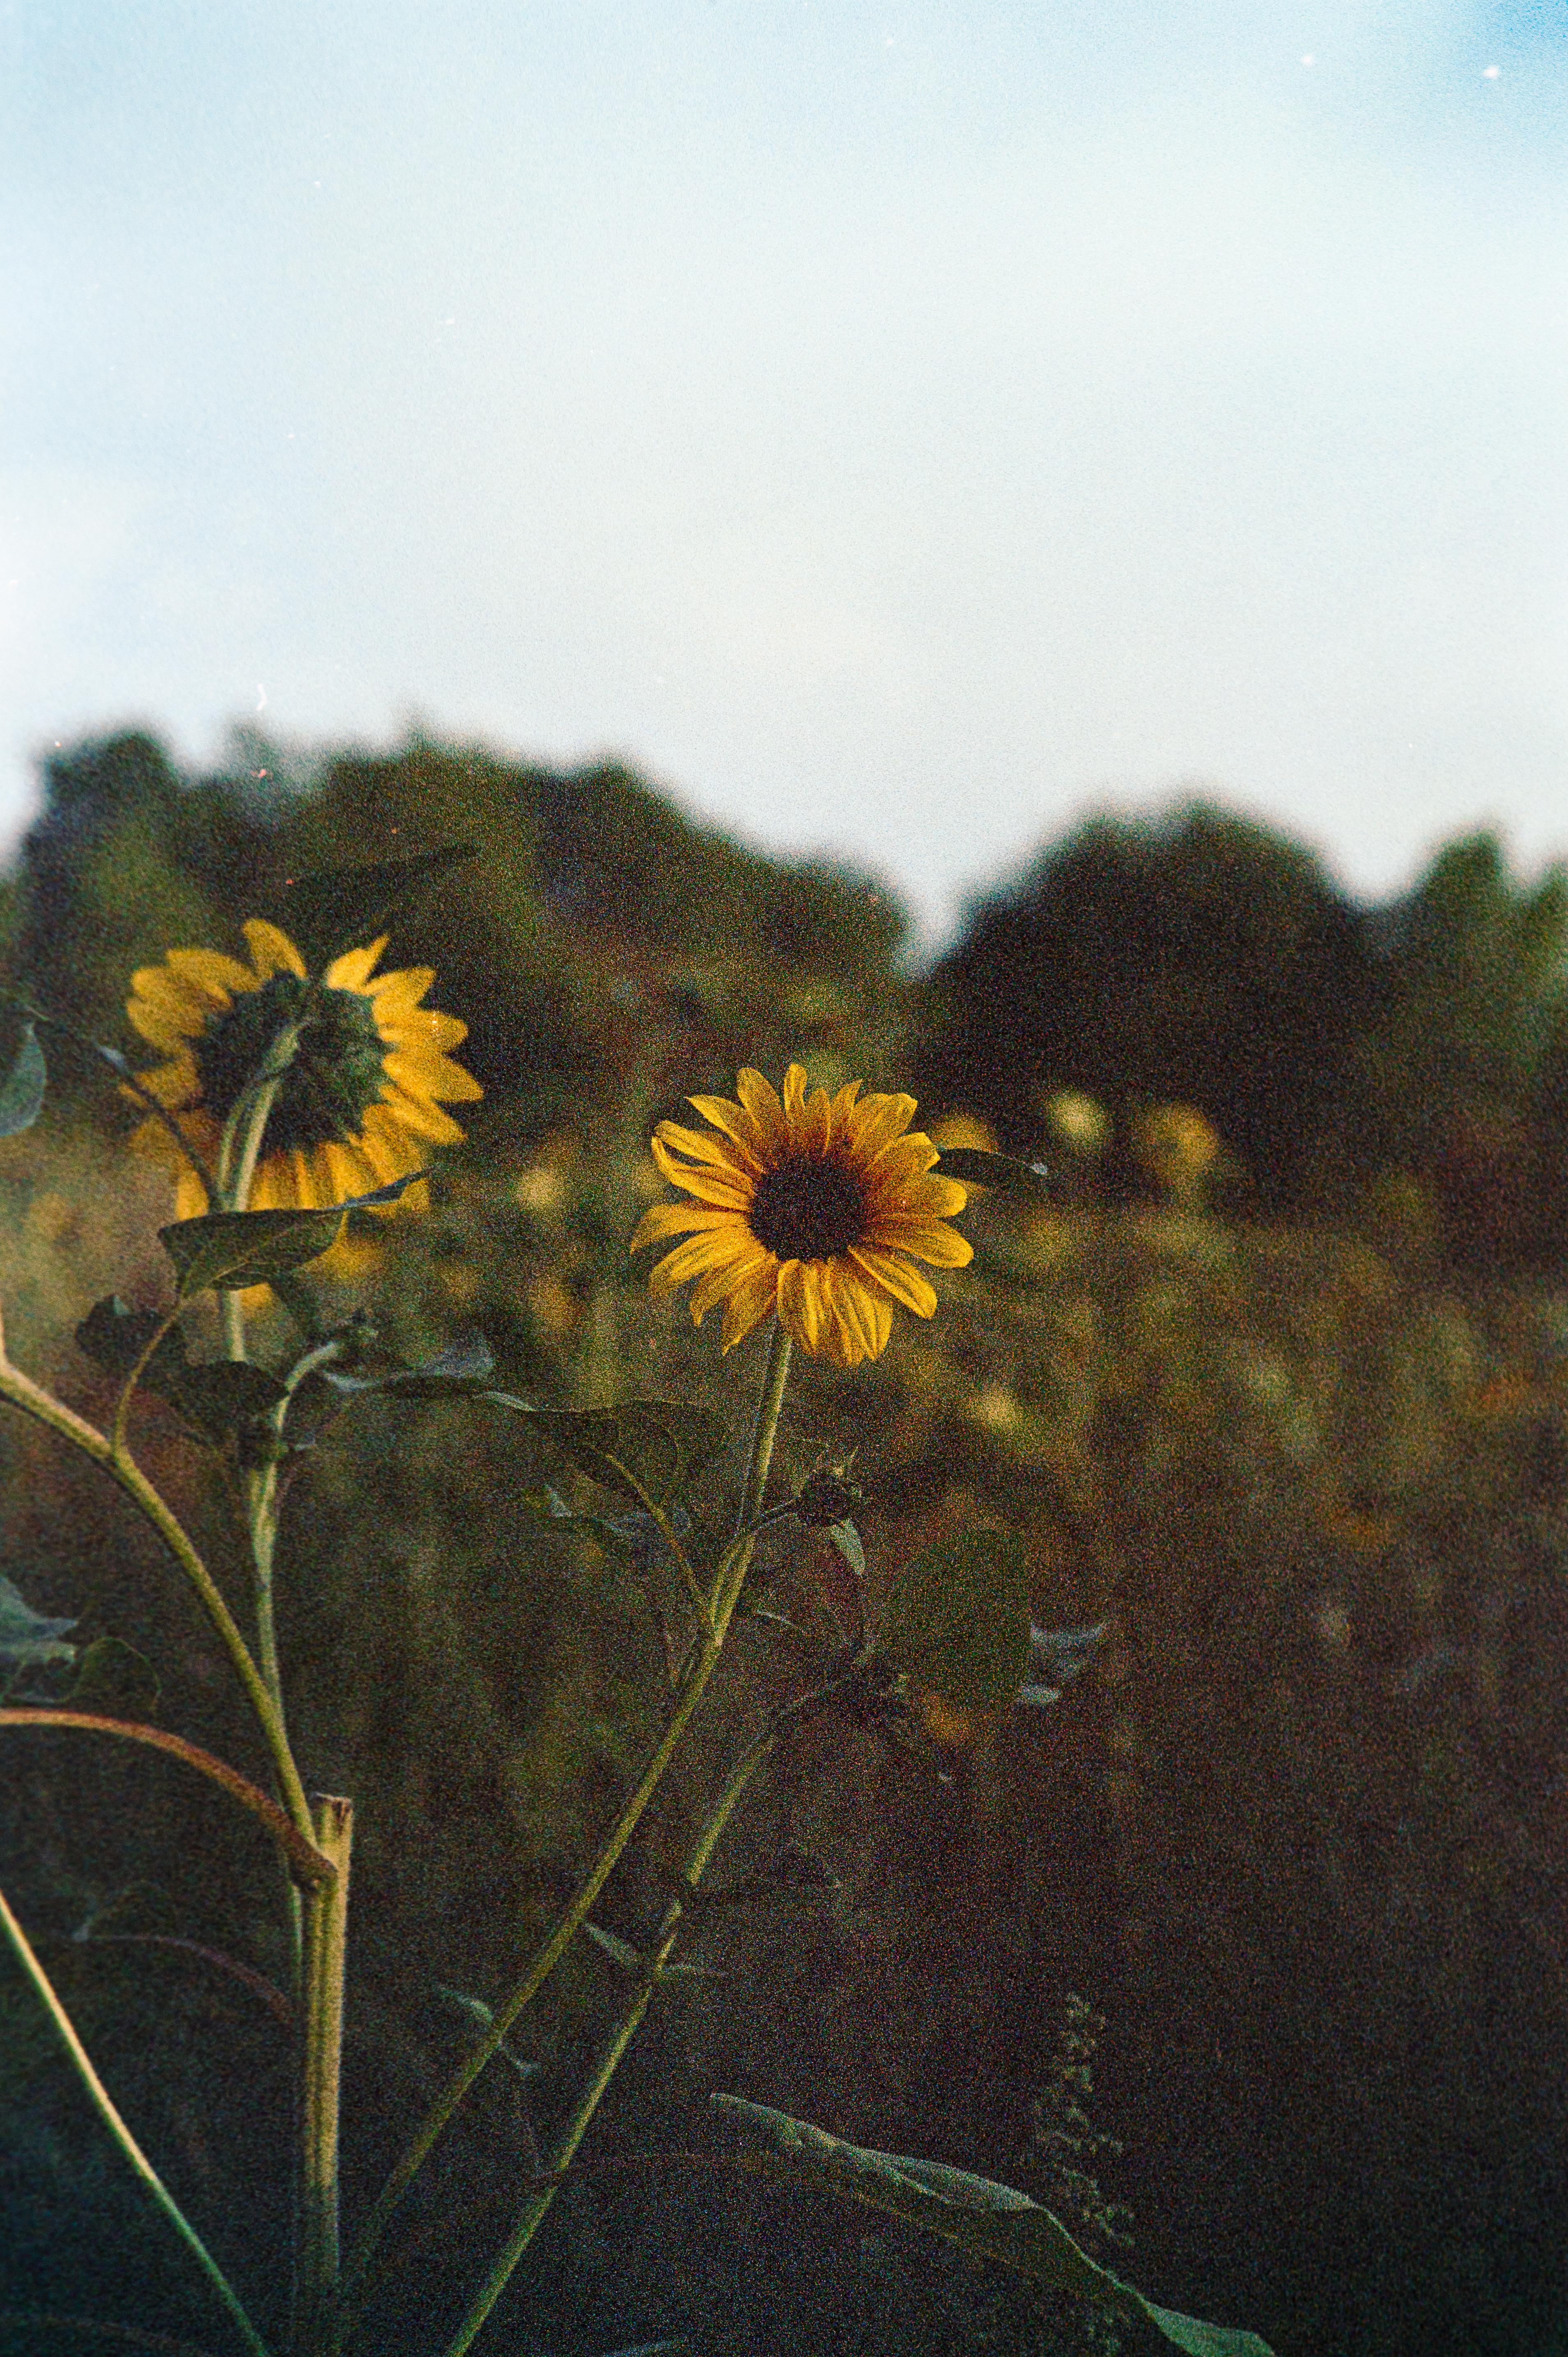 Sun's sunflower